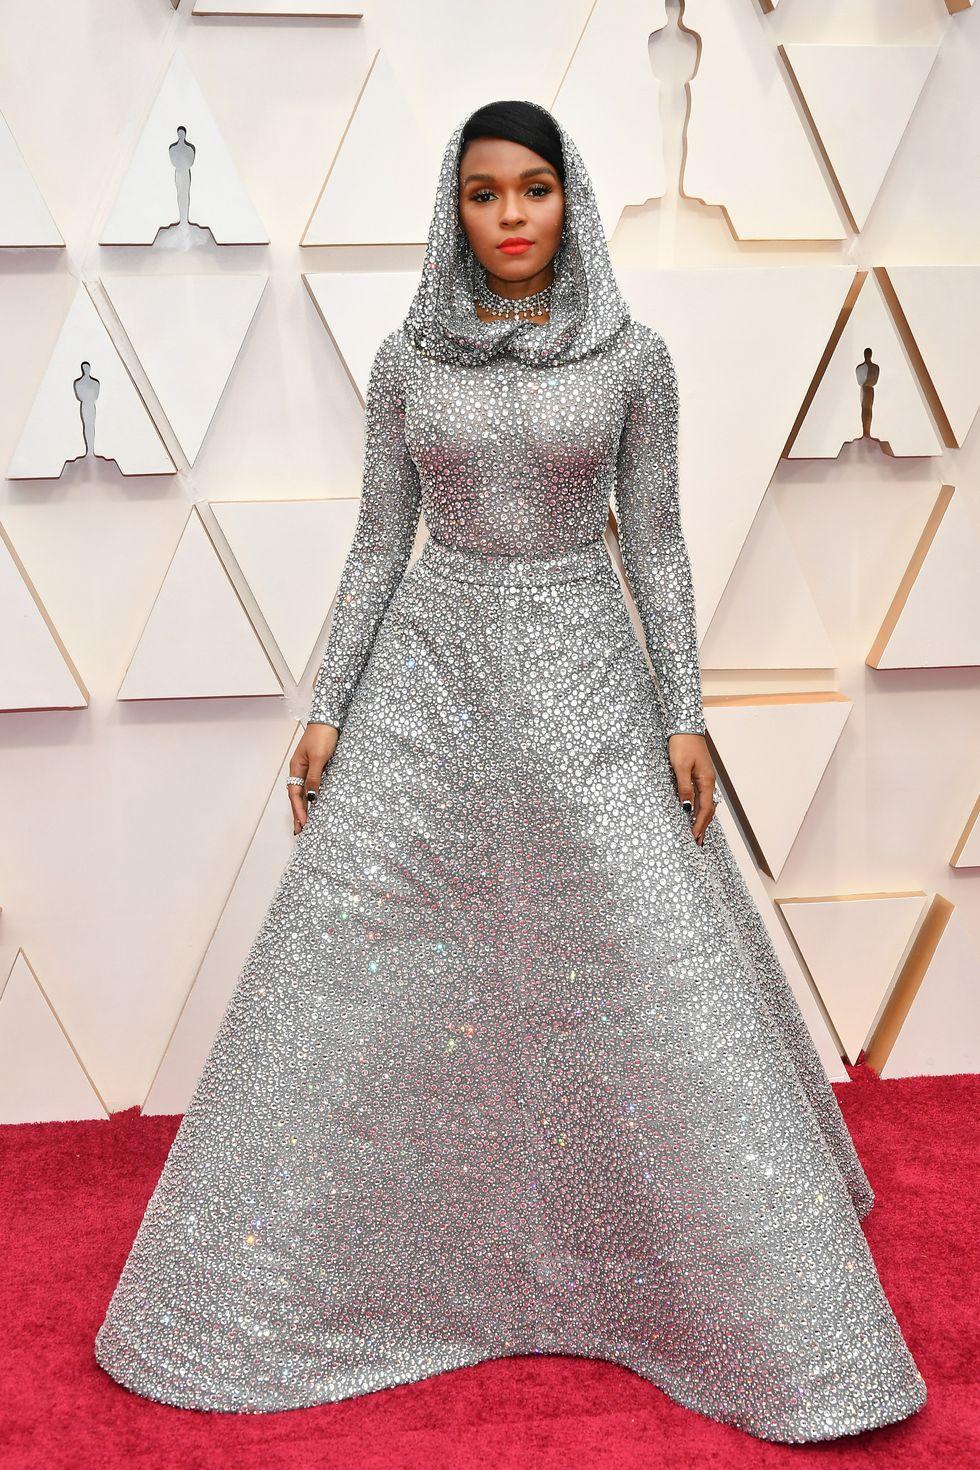 Vedete pe covorul roșu la Premiile Oscar 2020 (GALERIE FOTO II)